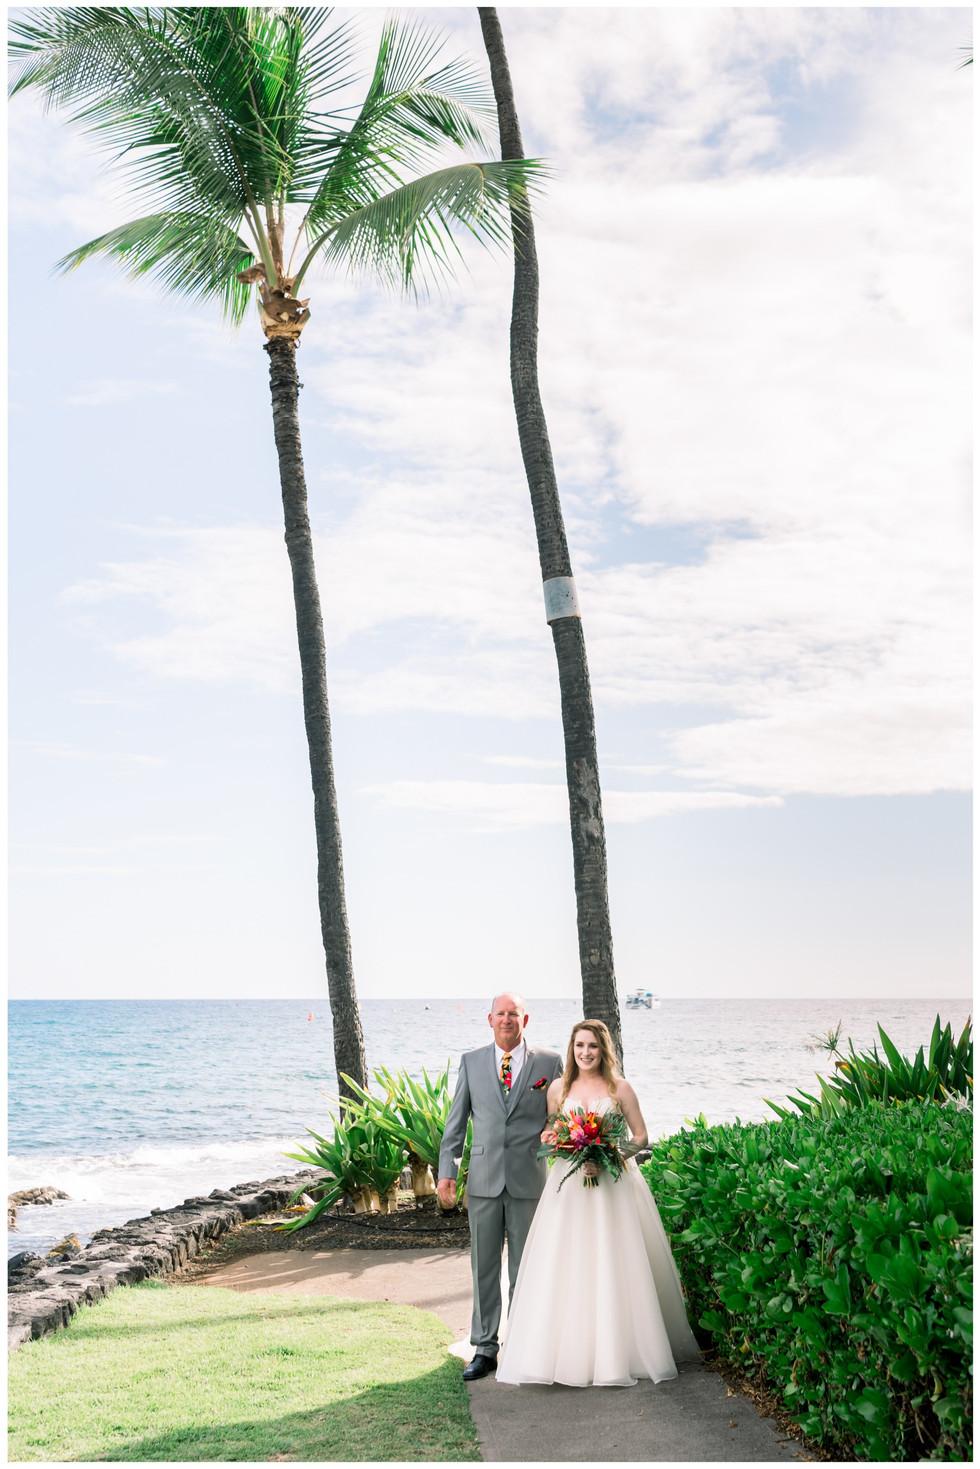 Kailua Kona Wedding Photographers 8.jpg